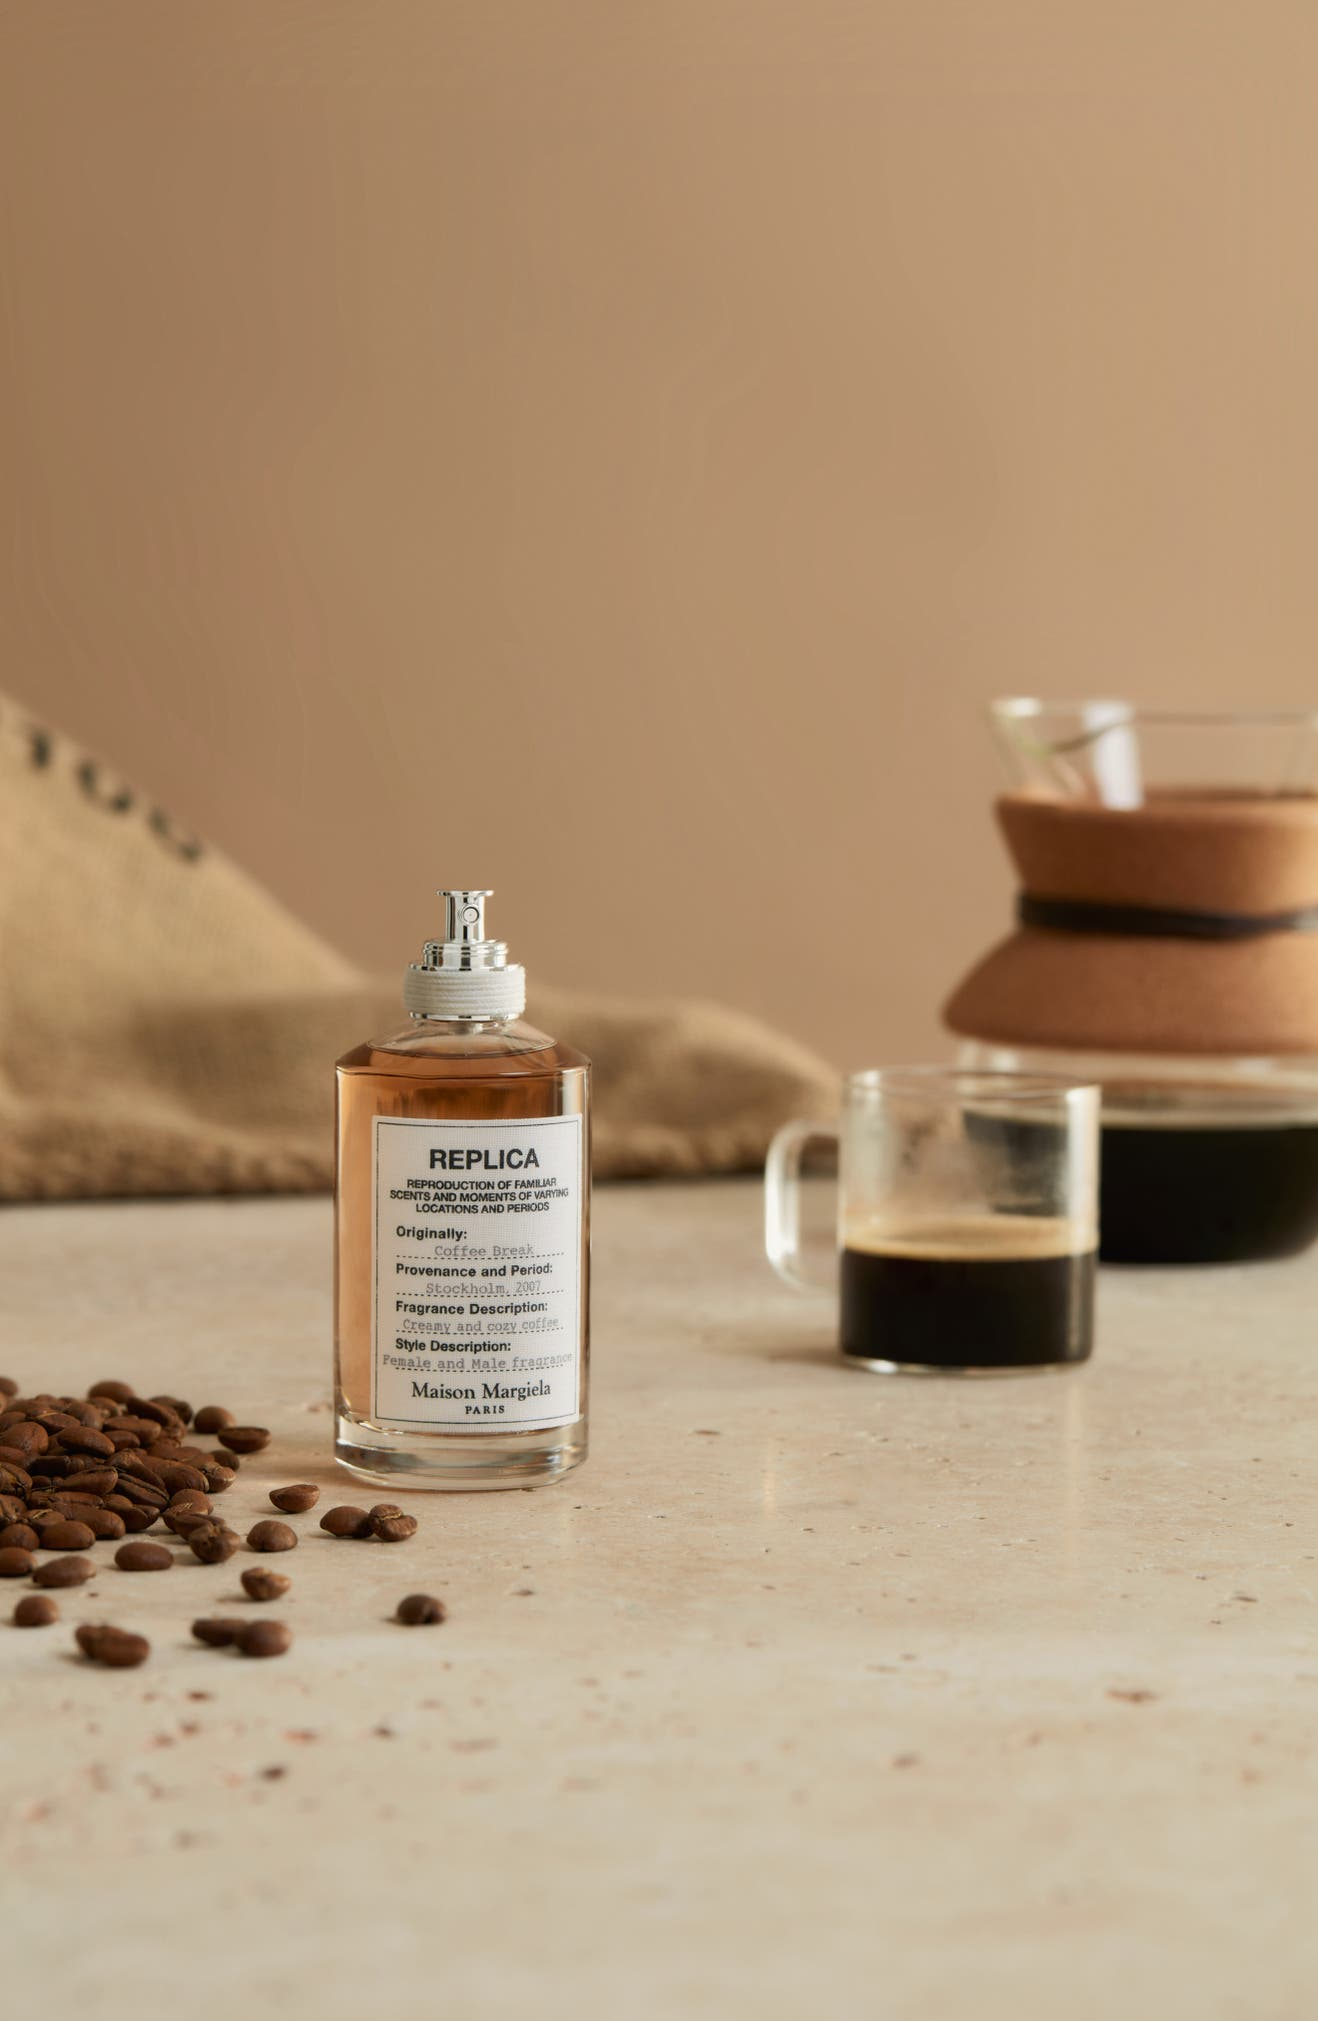 Image result for replica coffee break